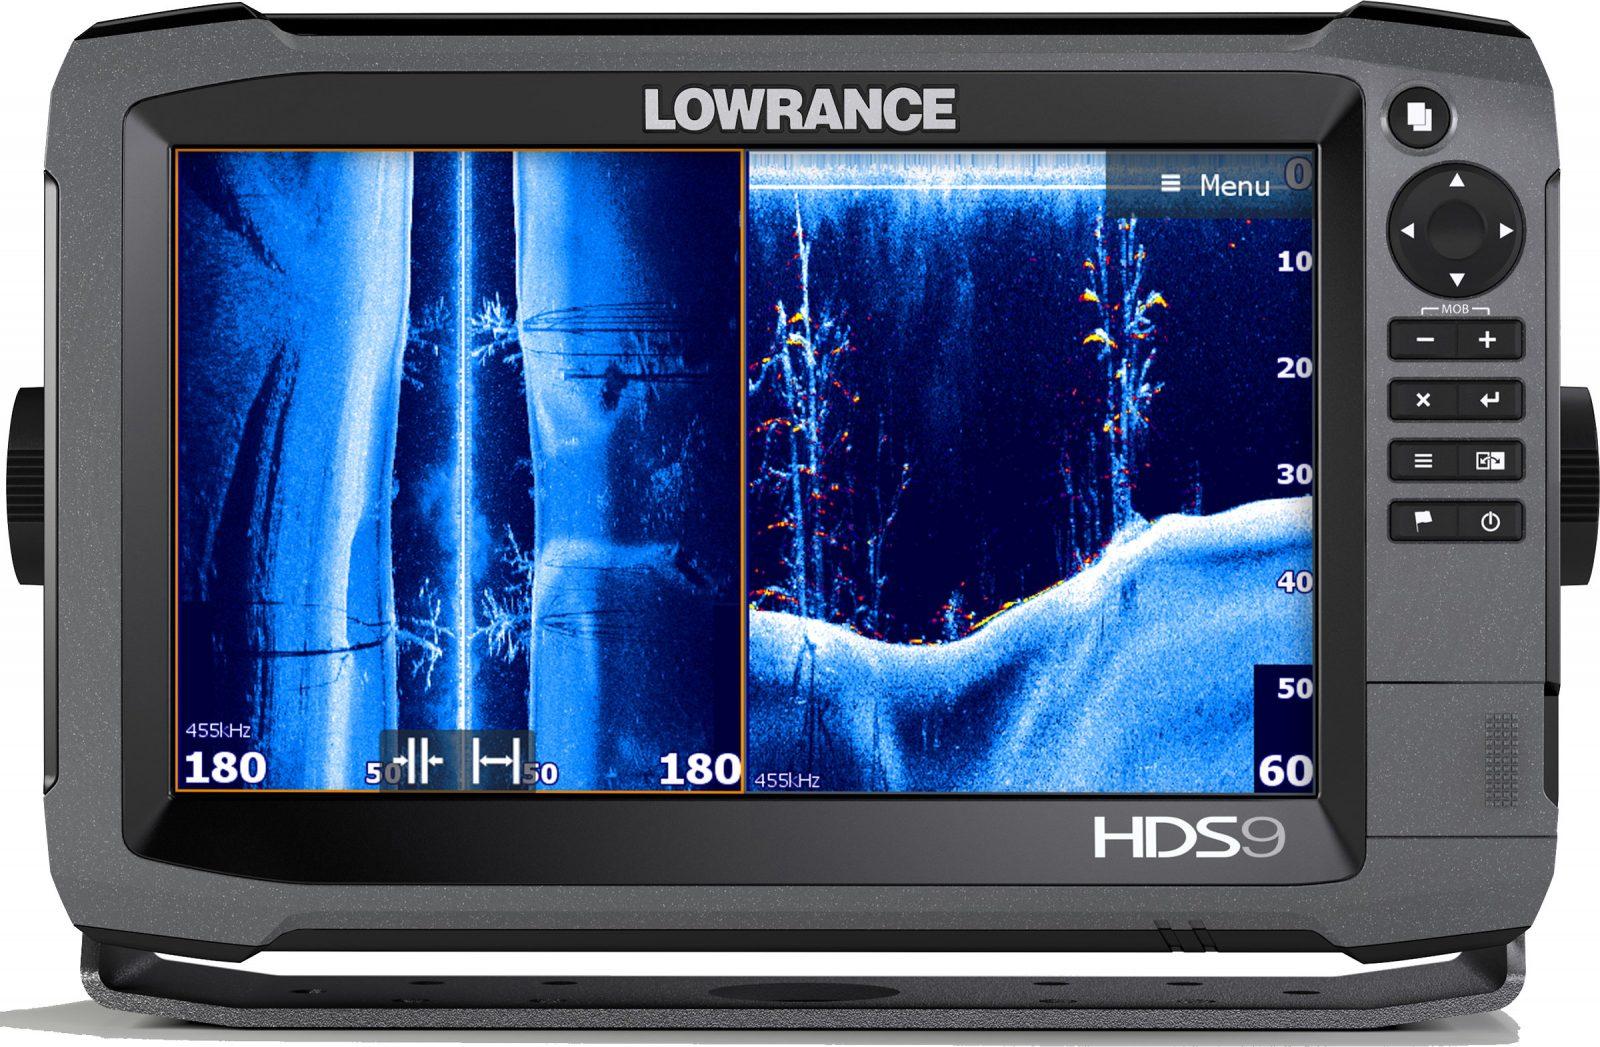 Garmin Update Software >> Lowrance Announces Software Update for HDS Carbon, Gen3 ...